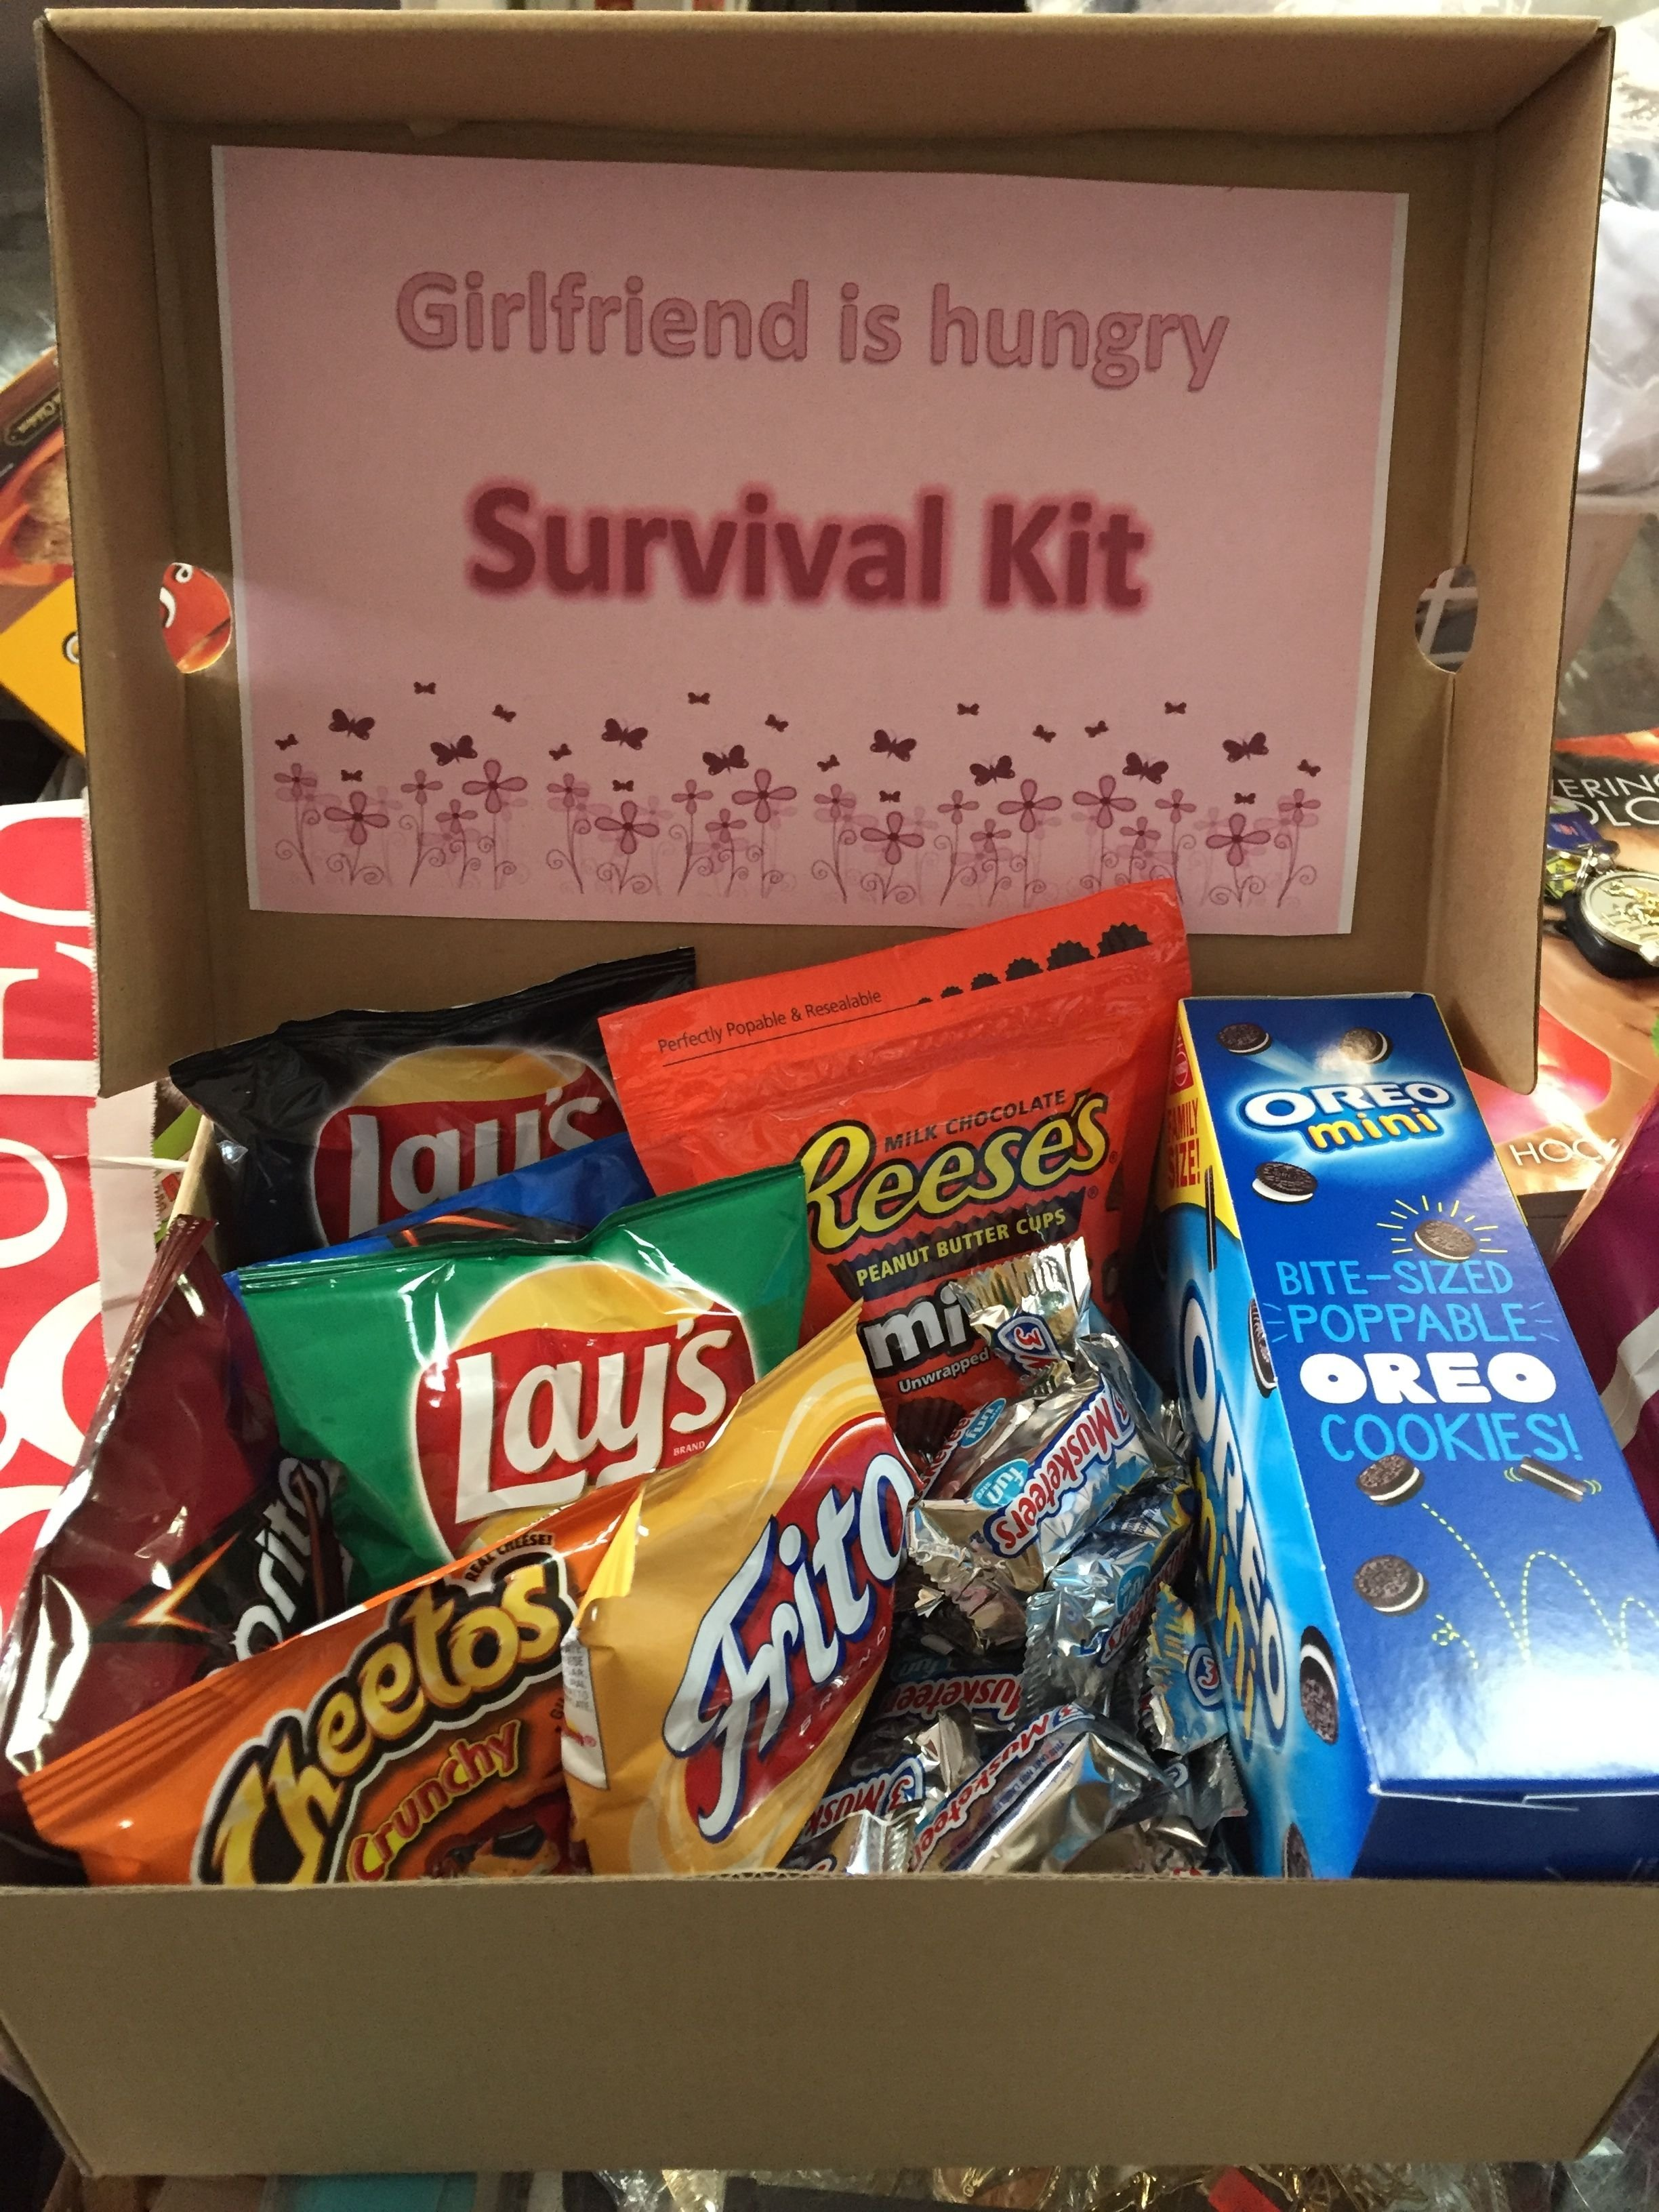 10 Amazing Good Gift Ideas For Your Girlfriend pintrey beckham on gf gift ideas pinterest survival kits 4 2021